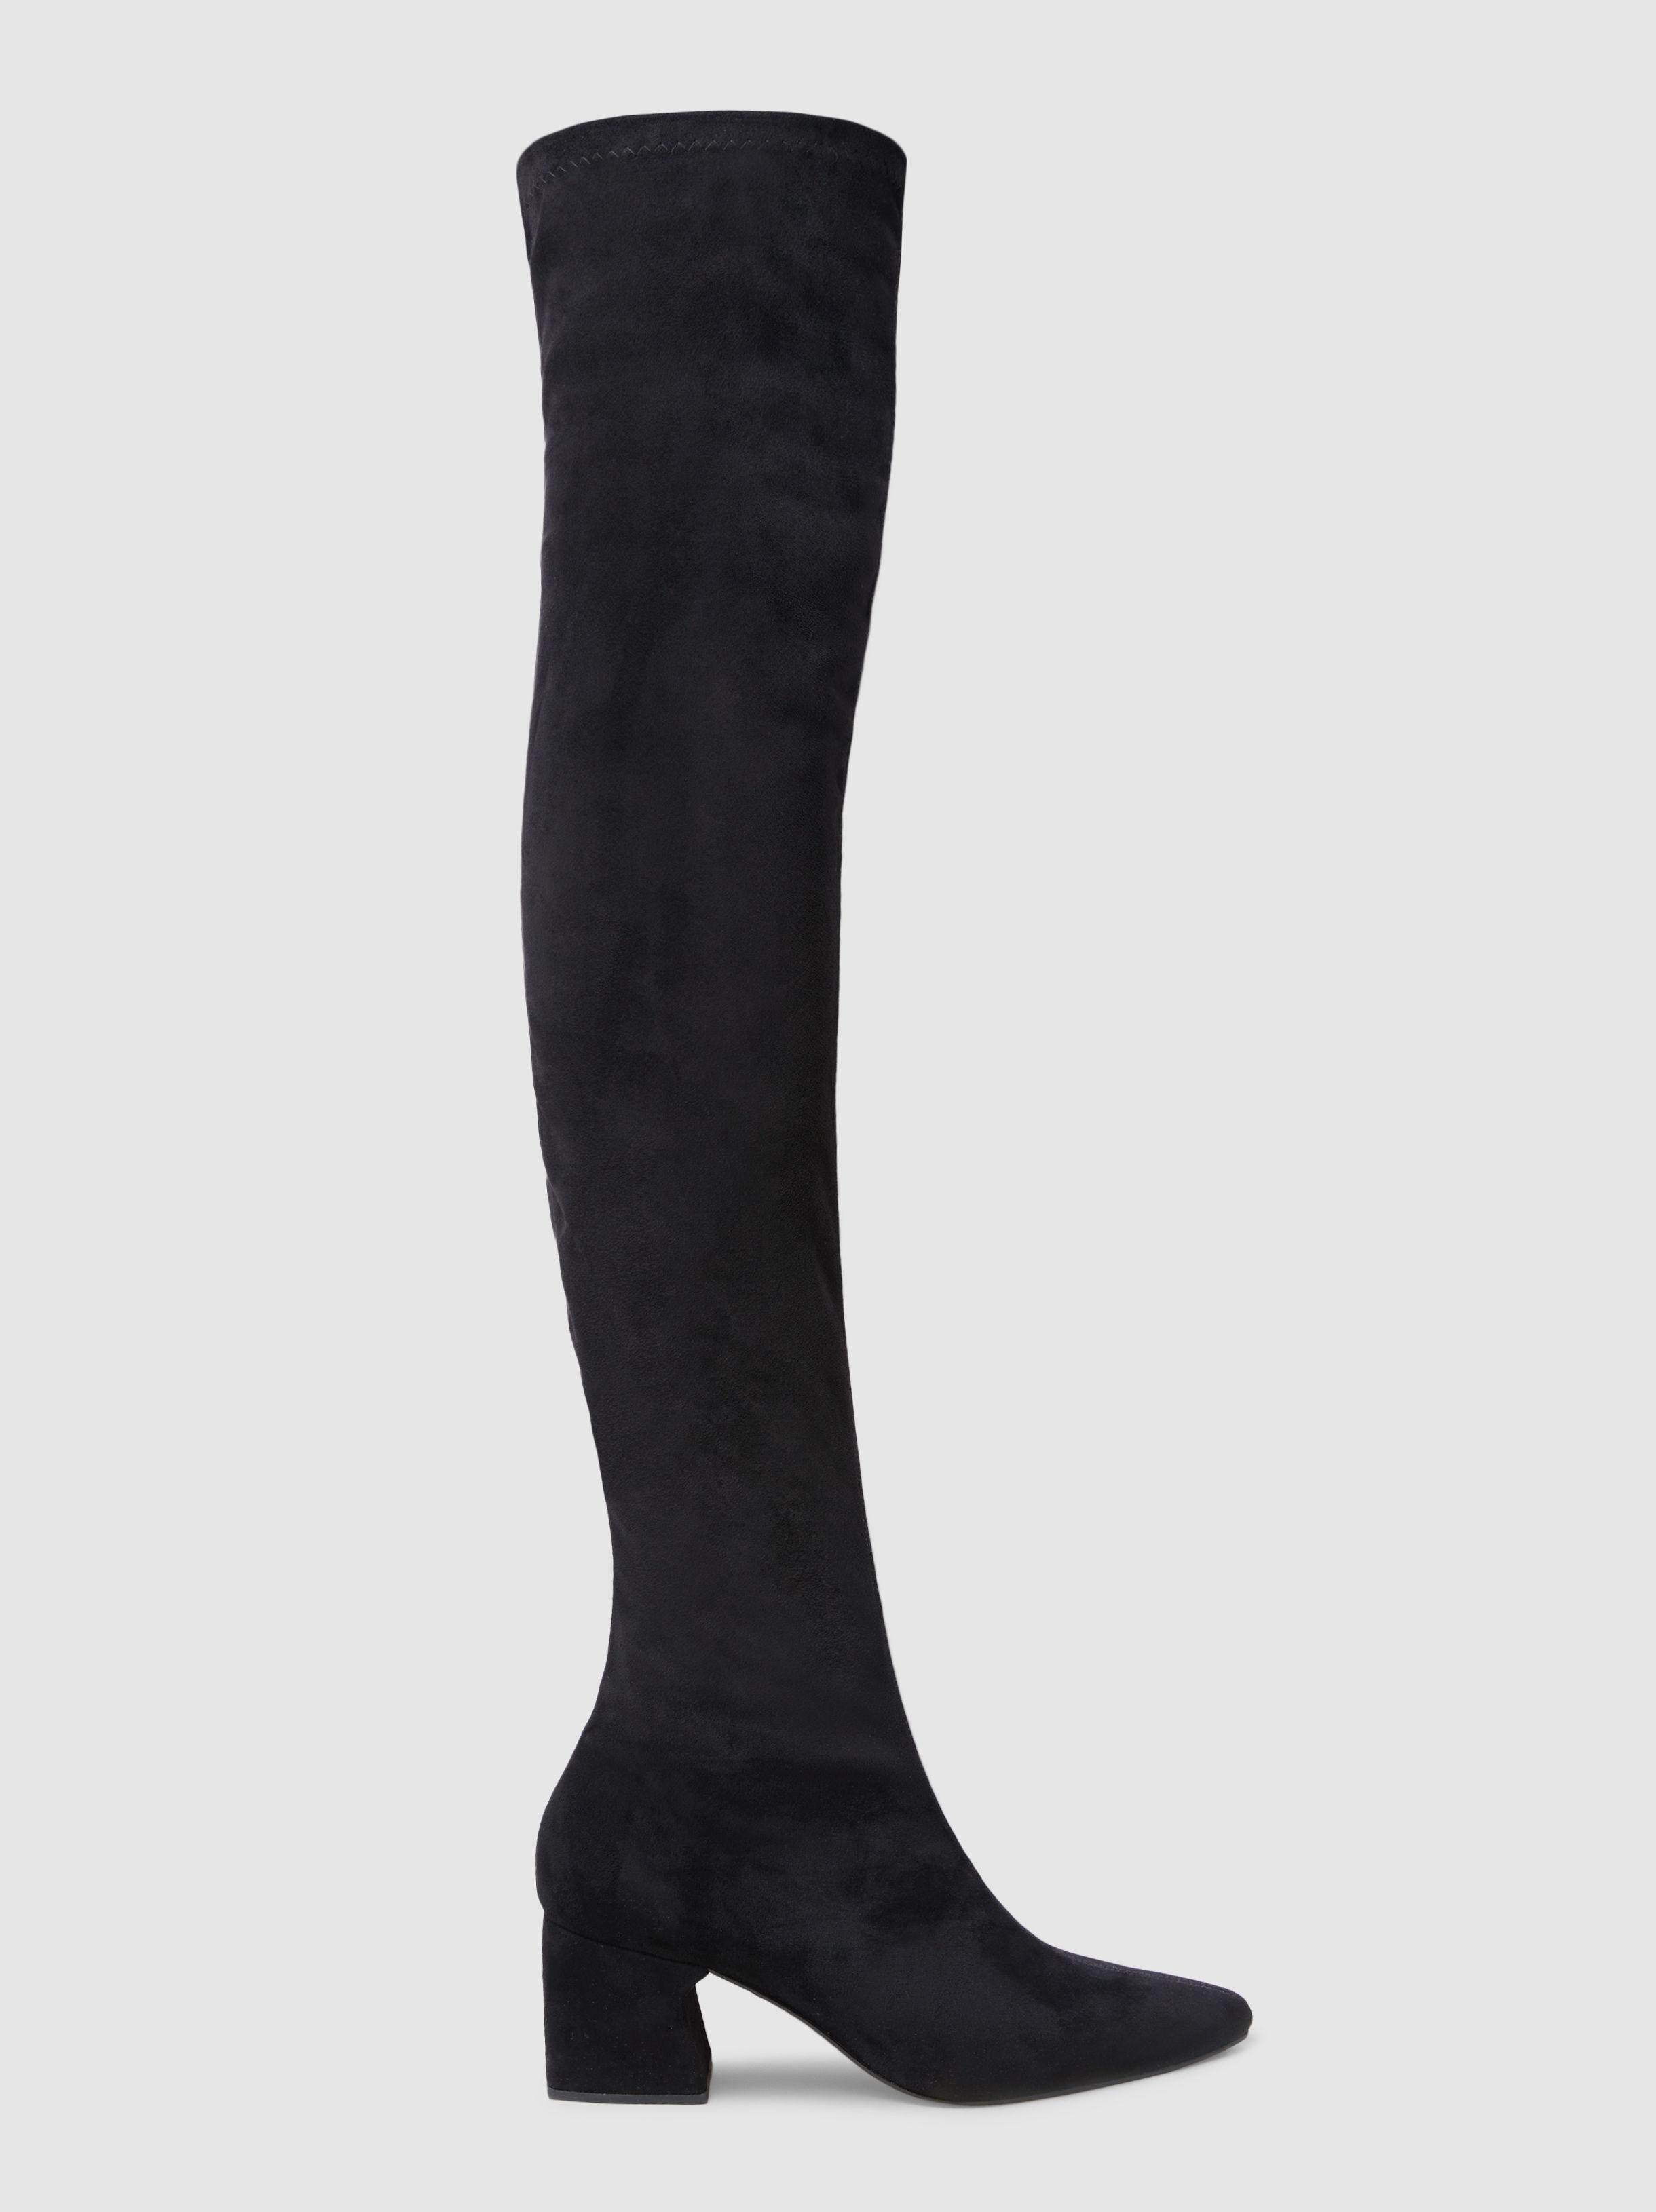 Hawks boots - Black Rachel Comey FRX1A